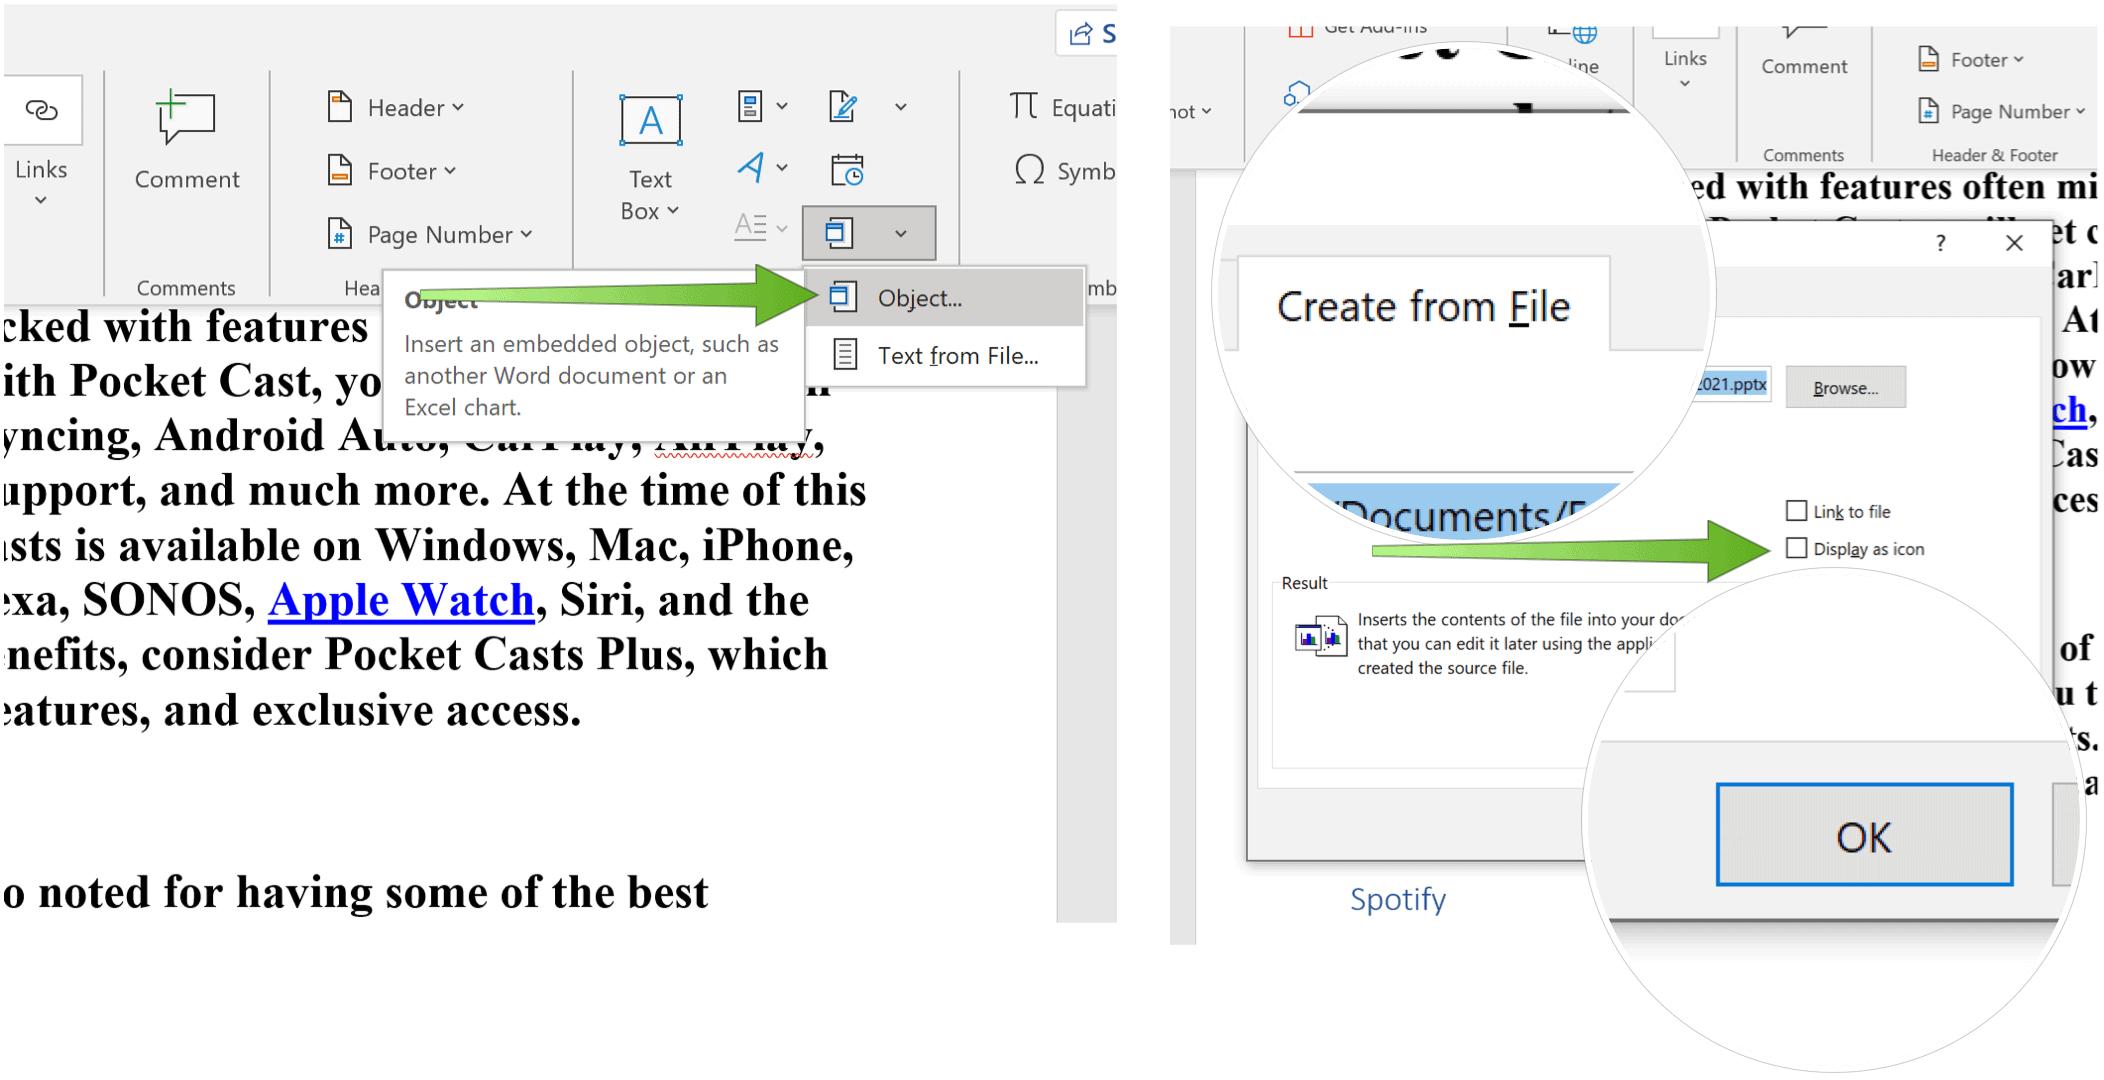 Sematkan PowerPoint Slide Powerpoint buat dari file